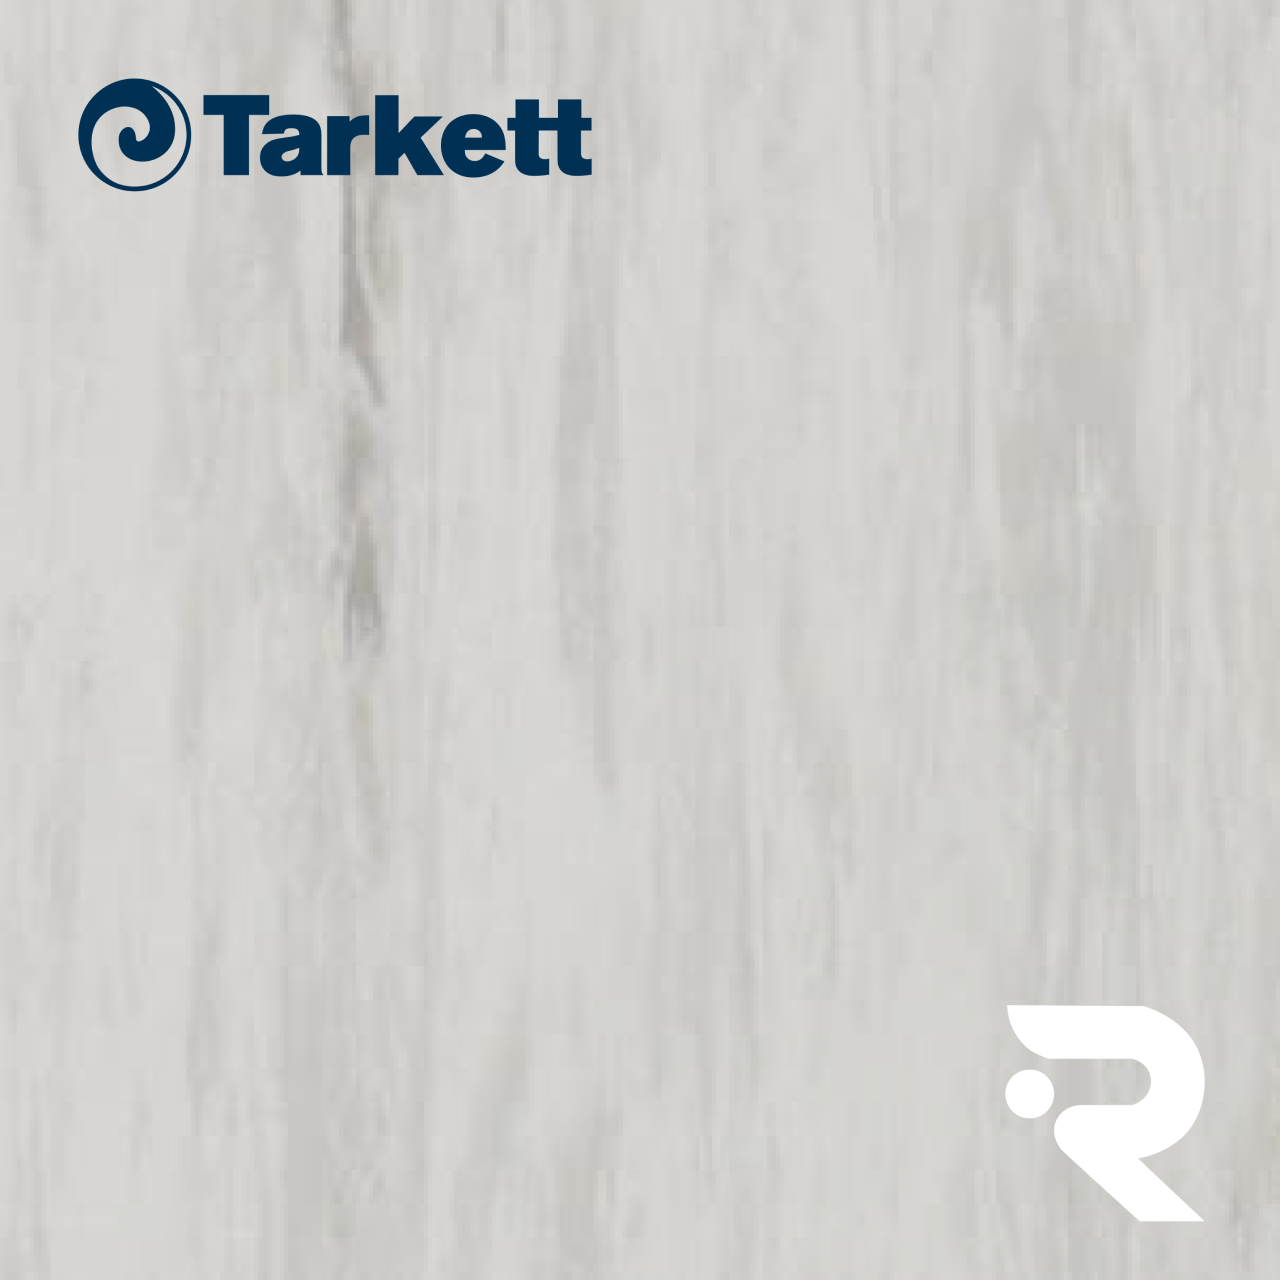 🏫 Гомогенный линолеум Tarkett   Standard STONE GREY 0924   Standard Plus 2.0 mm   610 х 610 мм